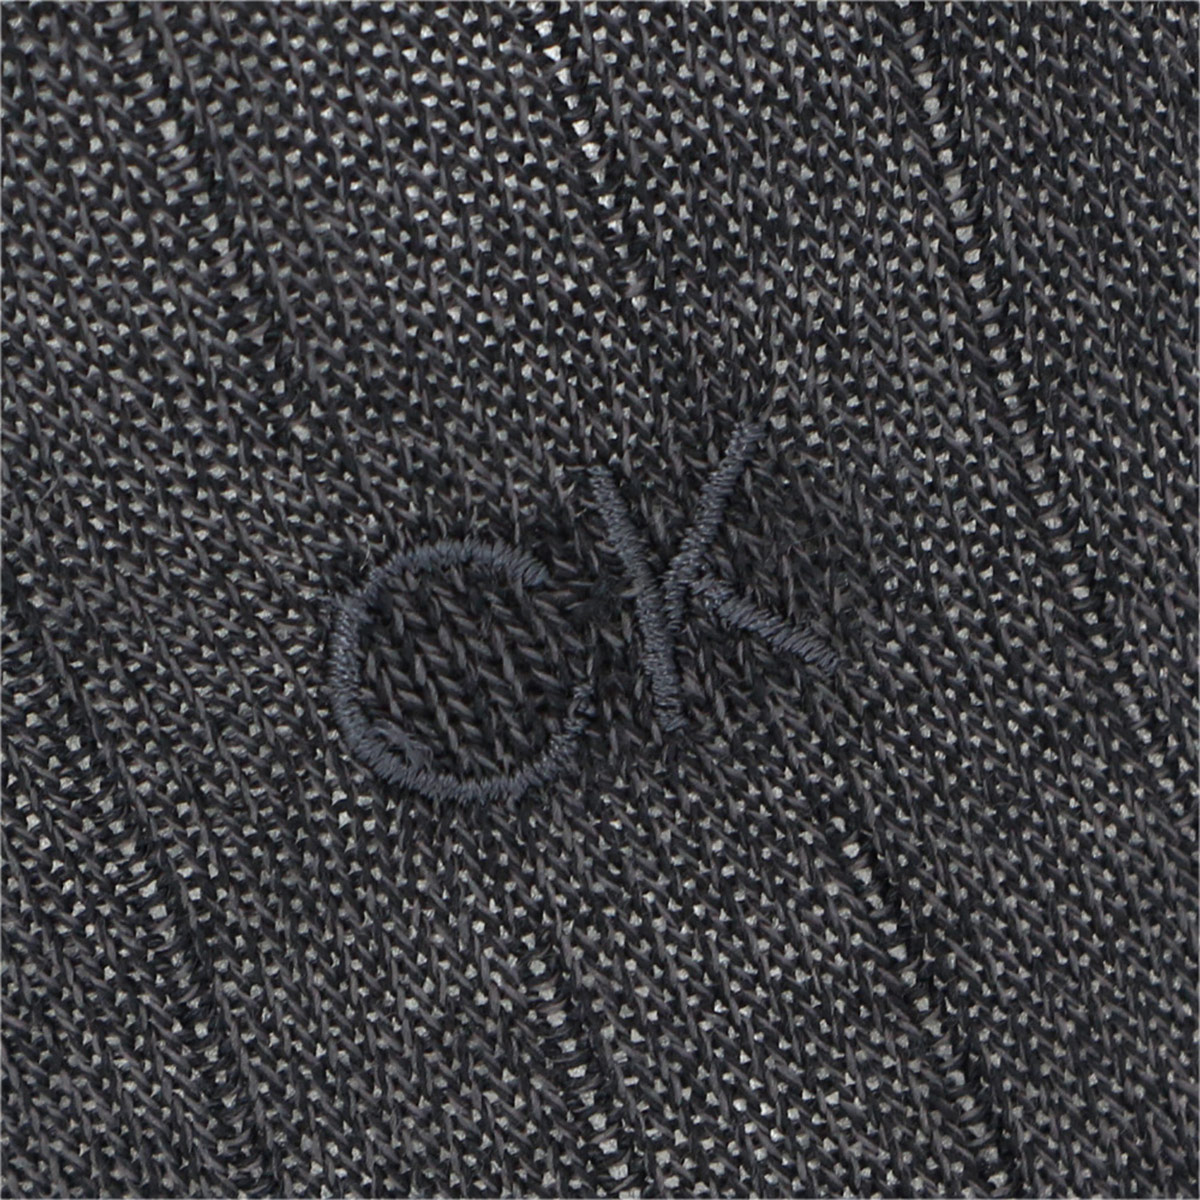 Calvin Klein( カルバンクライン )Dress ビジネス ロゴ刺繍 リブ クルー丈 ブランド靴下 3足組 ギフトセット オールシーズン用 ソックス 靴下 男性 メンズ 紳士 CK-30 giftset【ゆうパケット・お取り扱い不可】